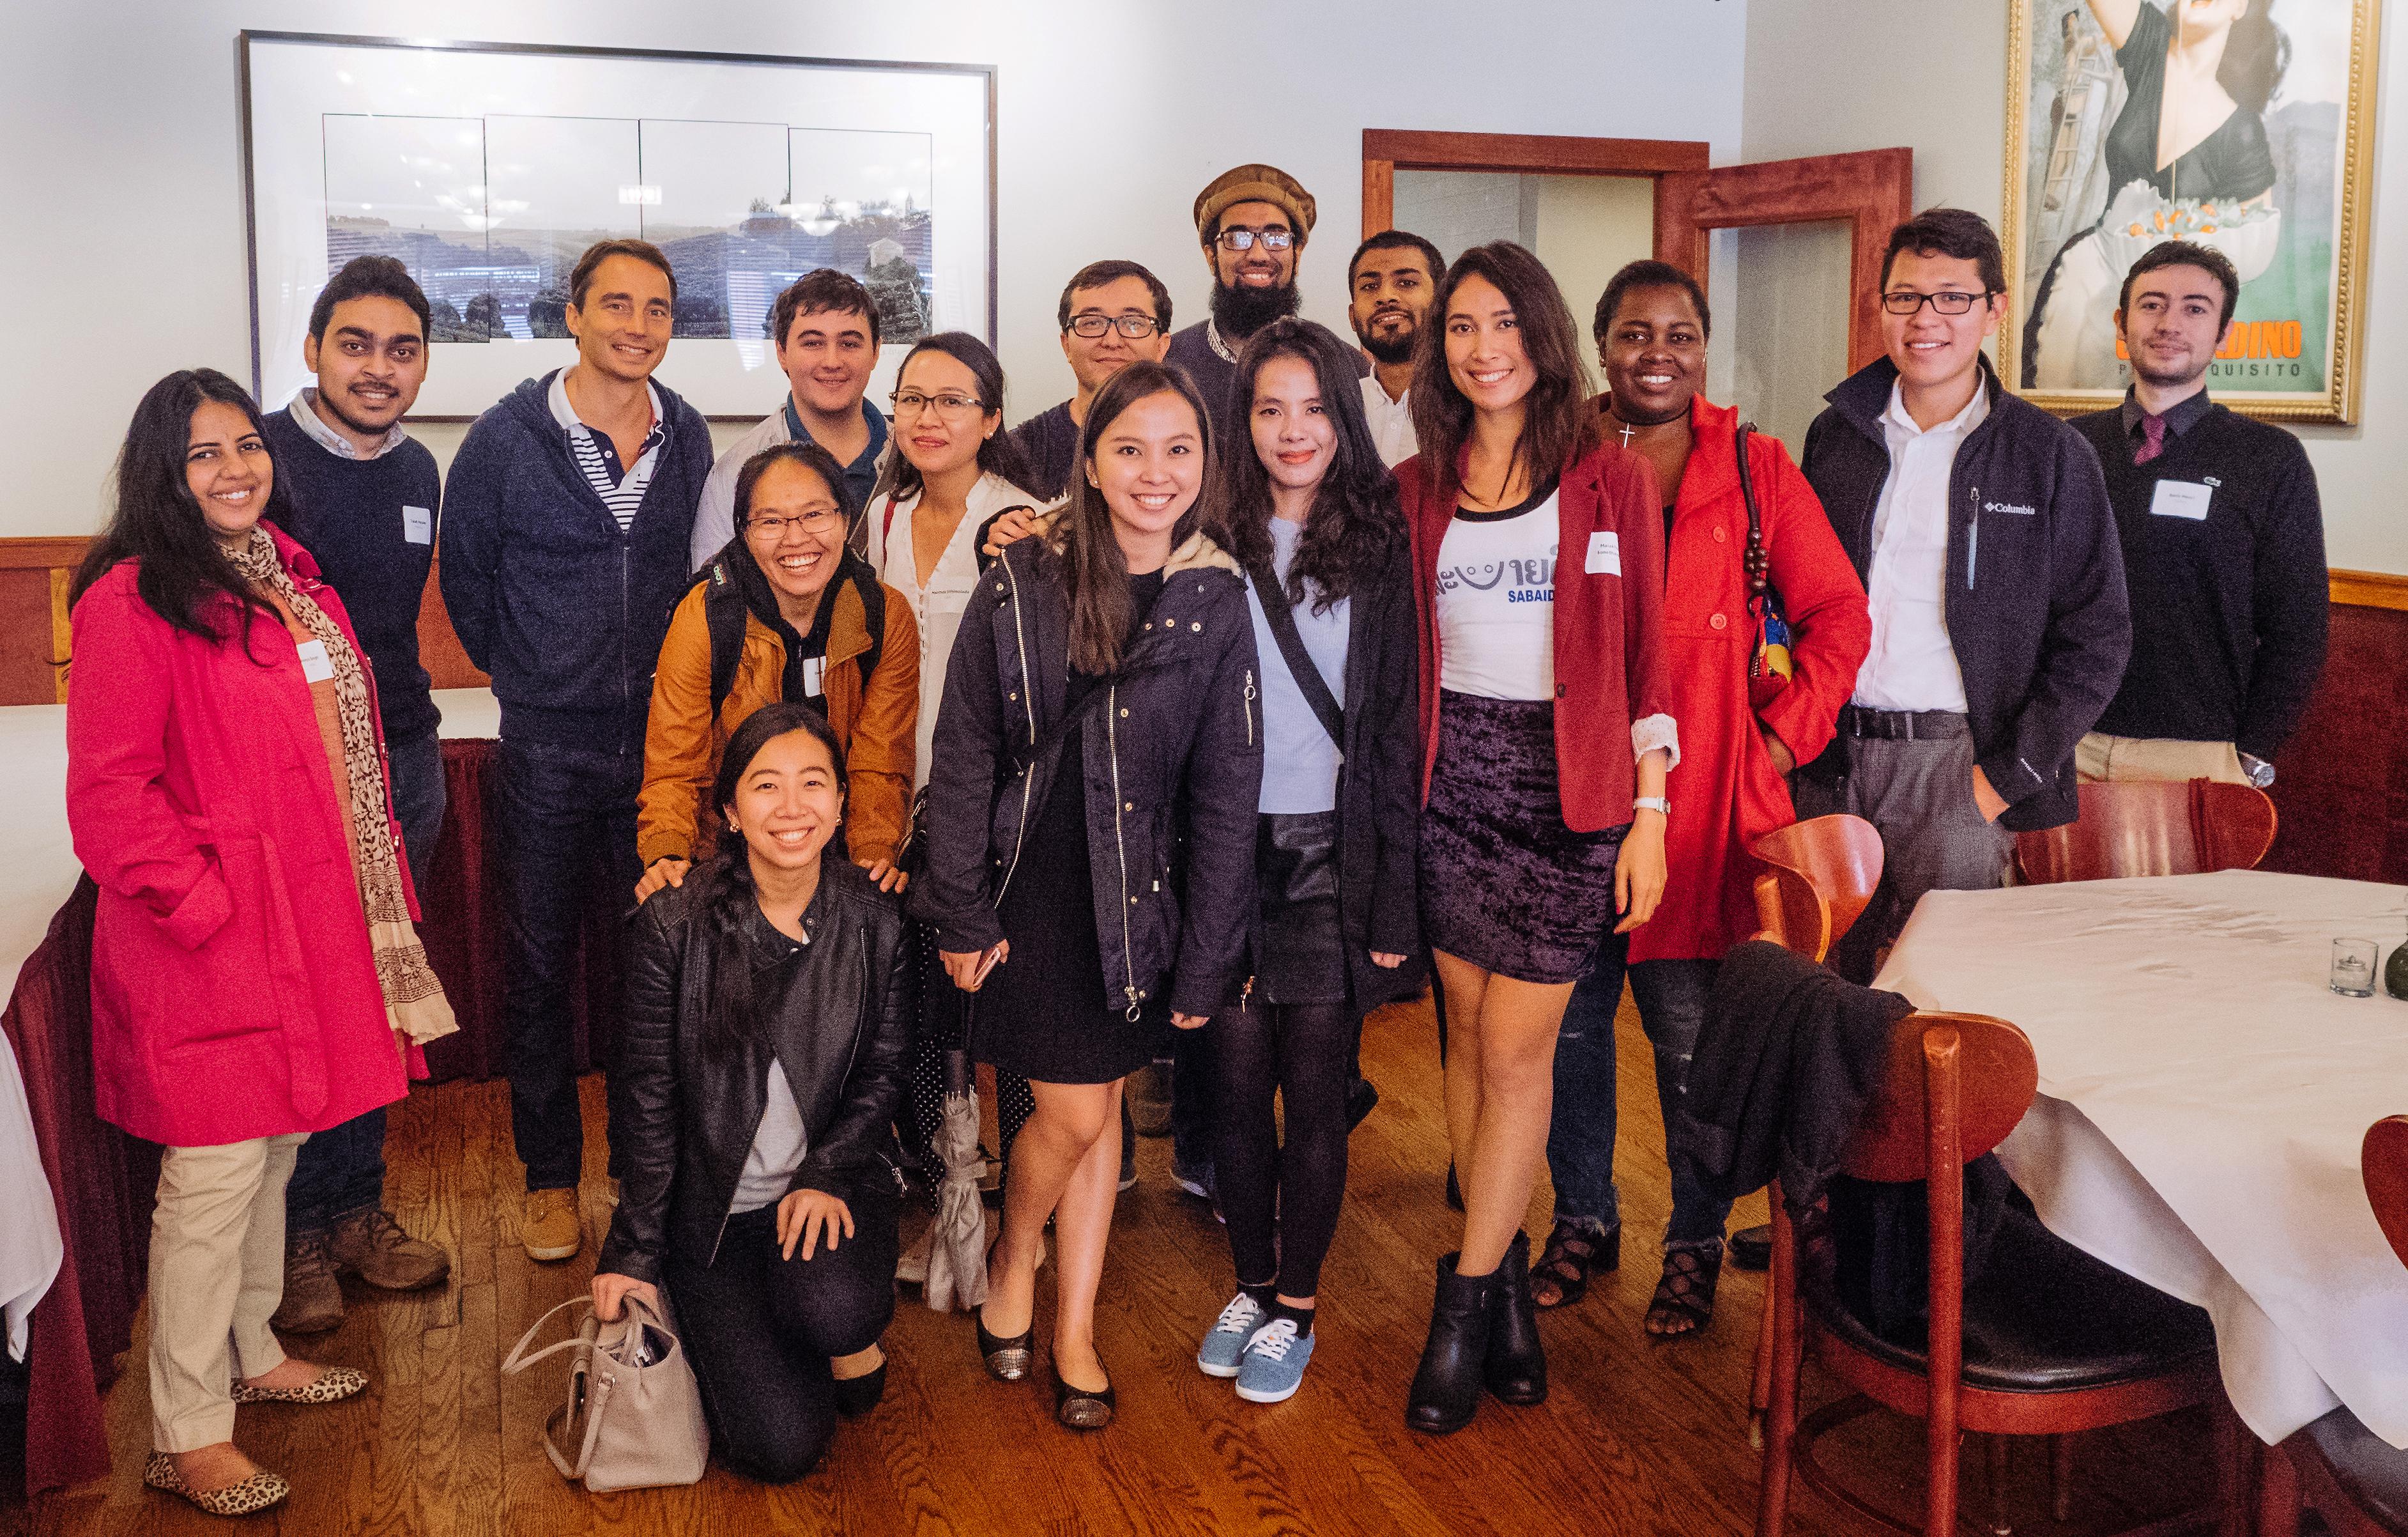 Group photo showing the international Fulbright spirit!